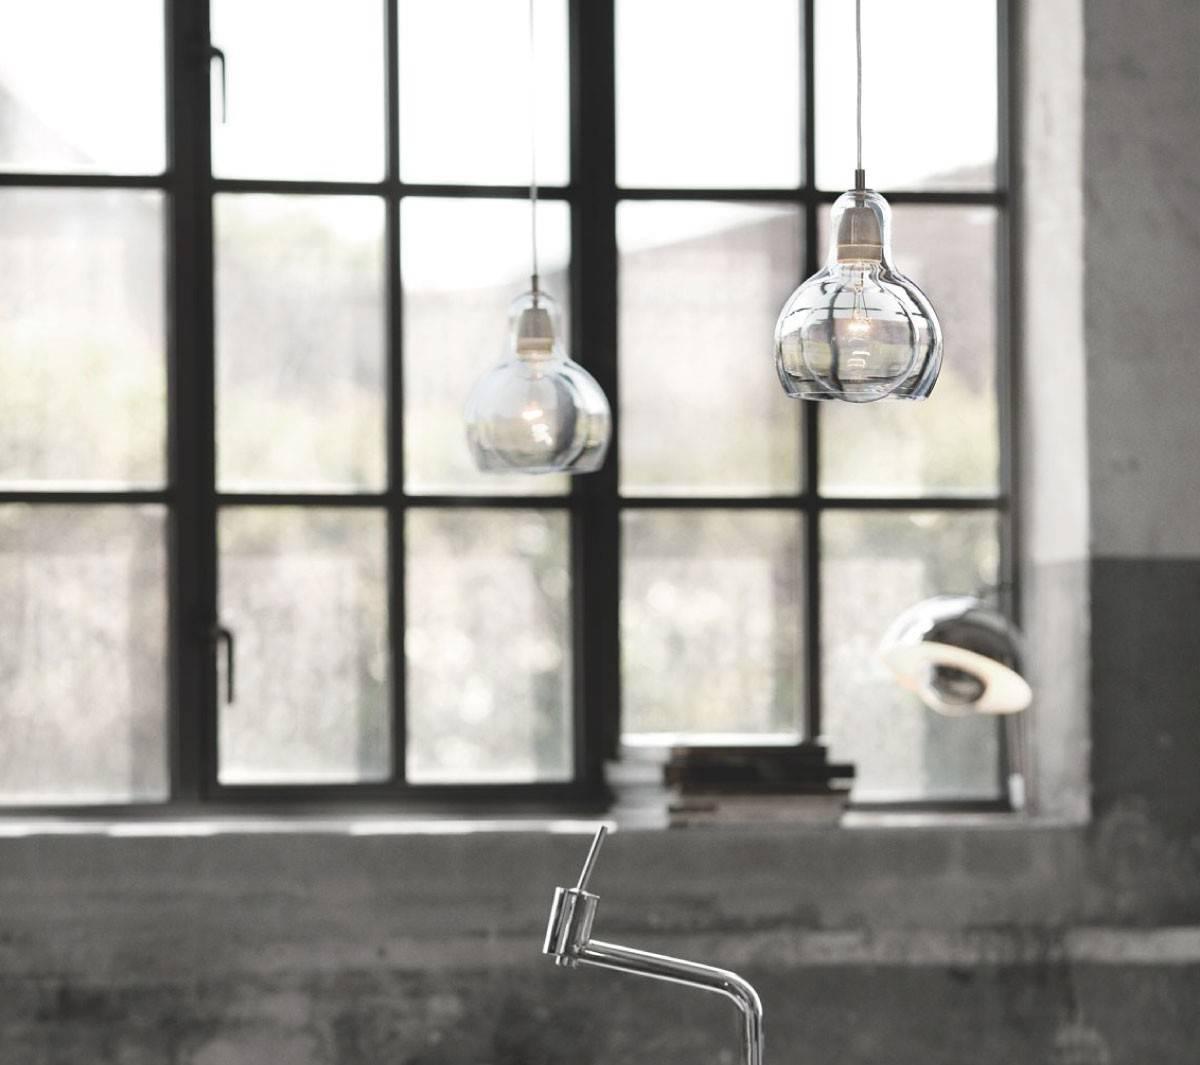 Design Lamp Mega Bulb&tradition – Luxury Interior Design Inside Mega Bulb Pendant Lights (View 10 of 15)